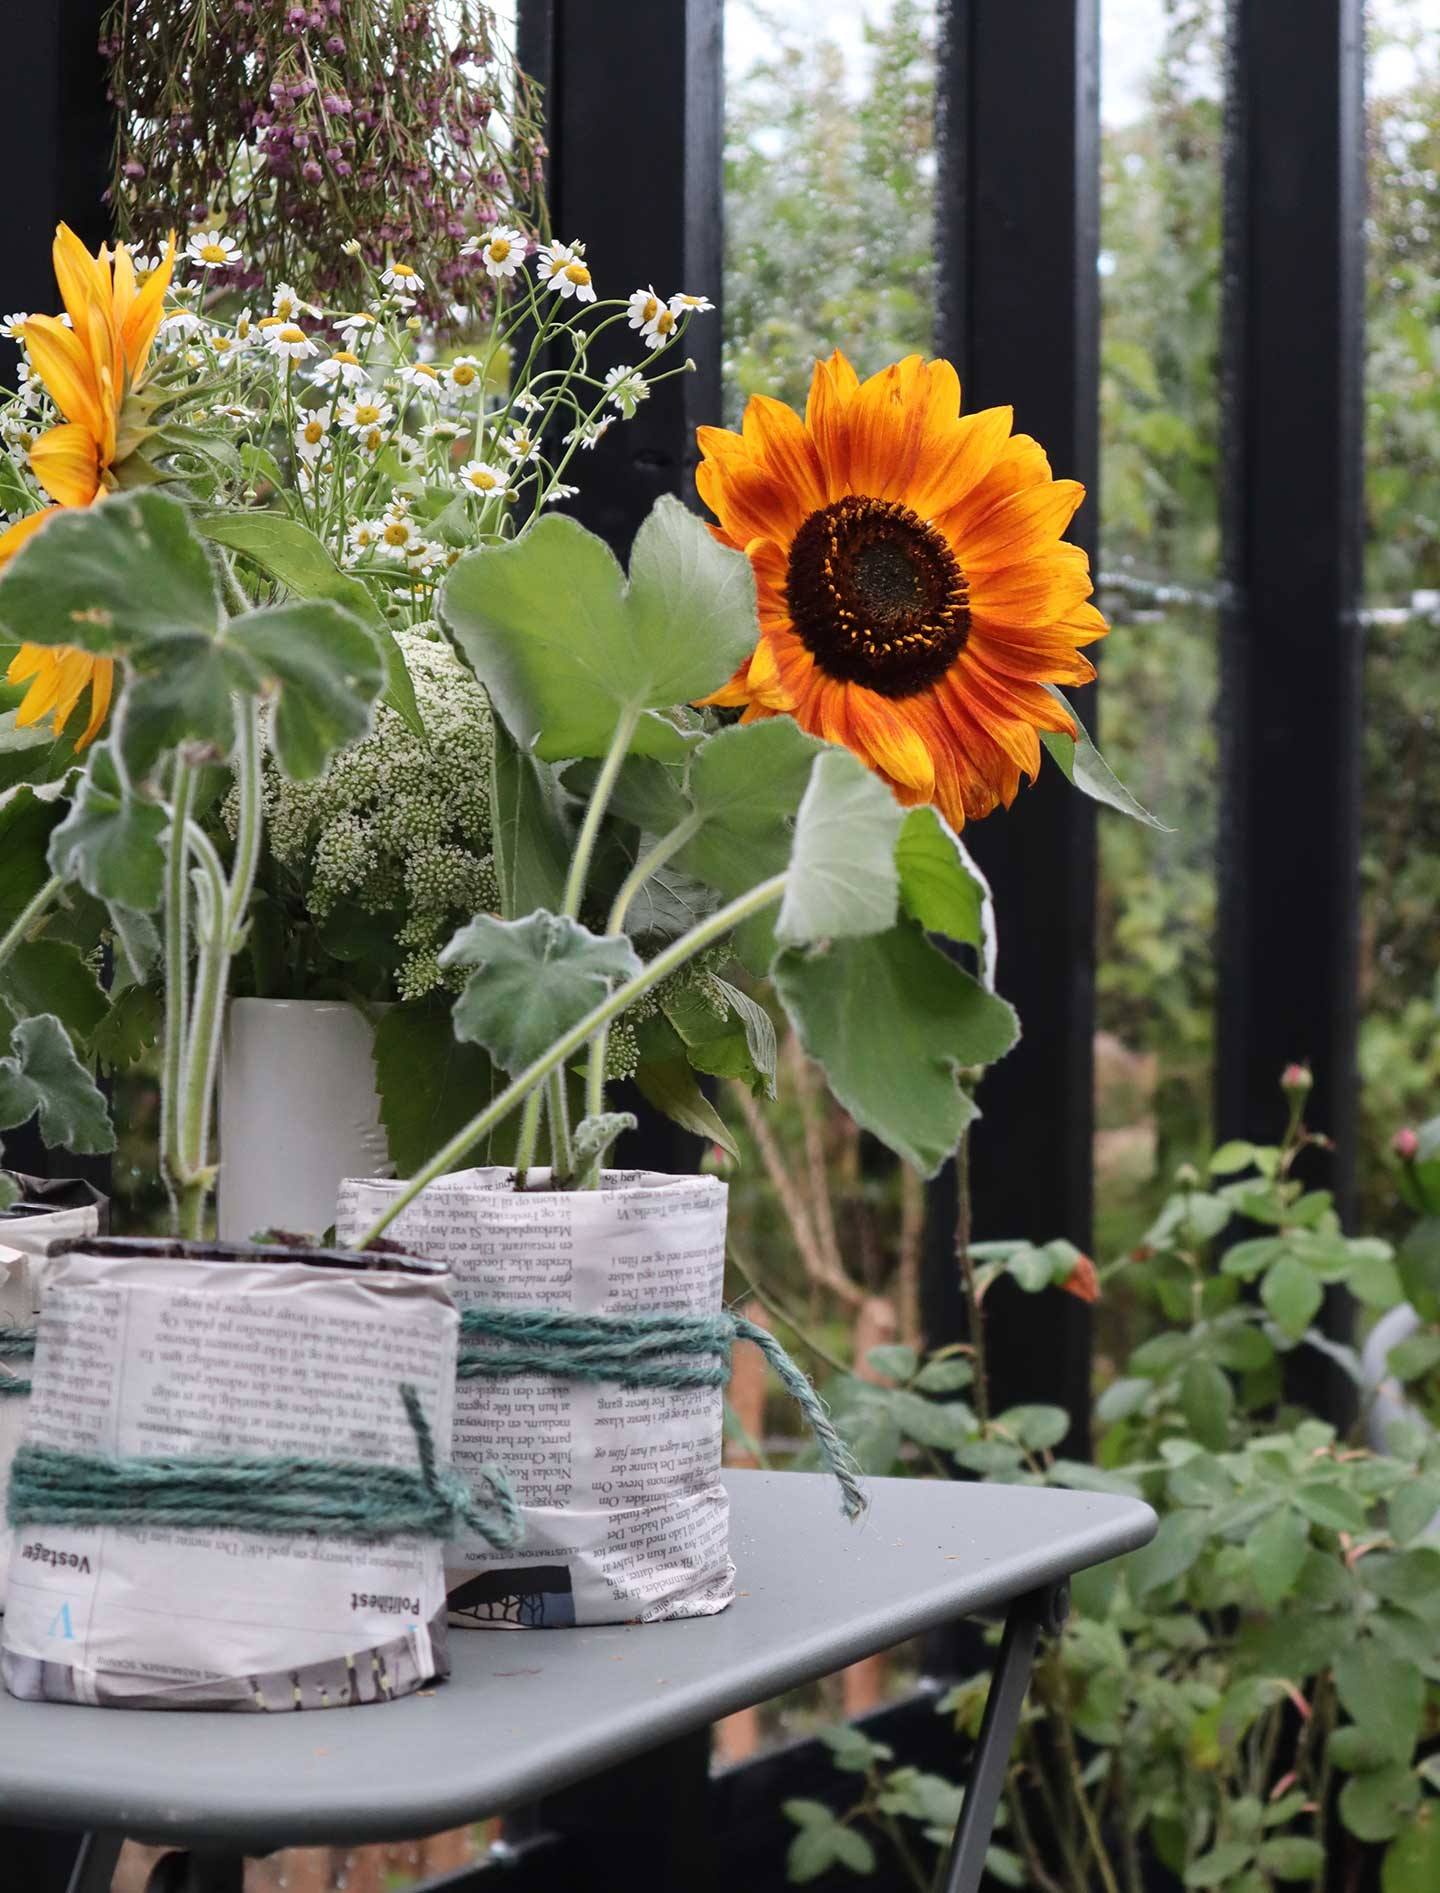 Plantebord med solsikker i sort drivhus